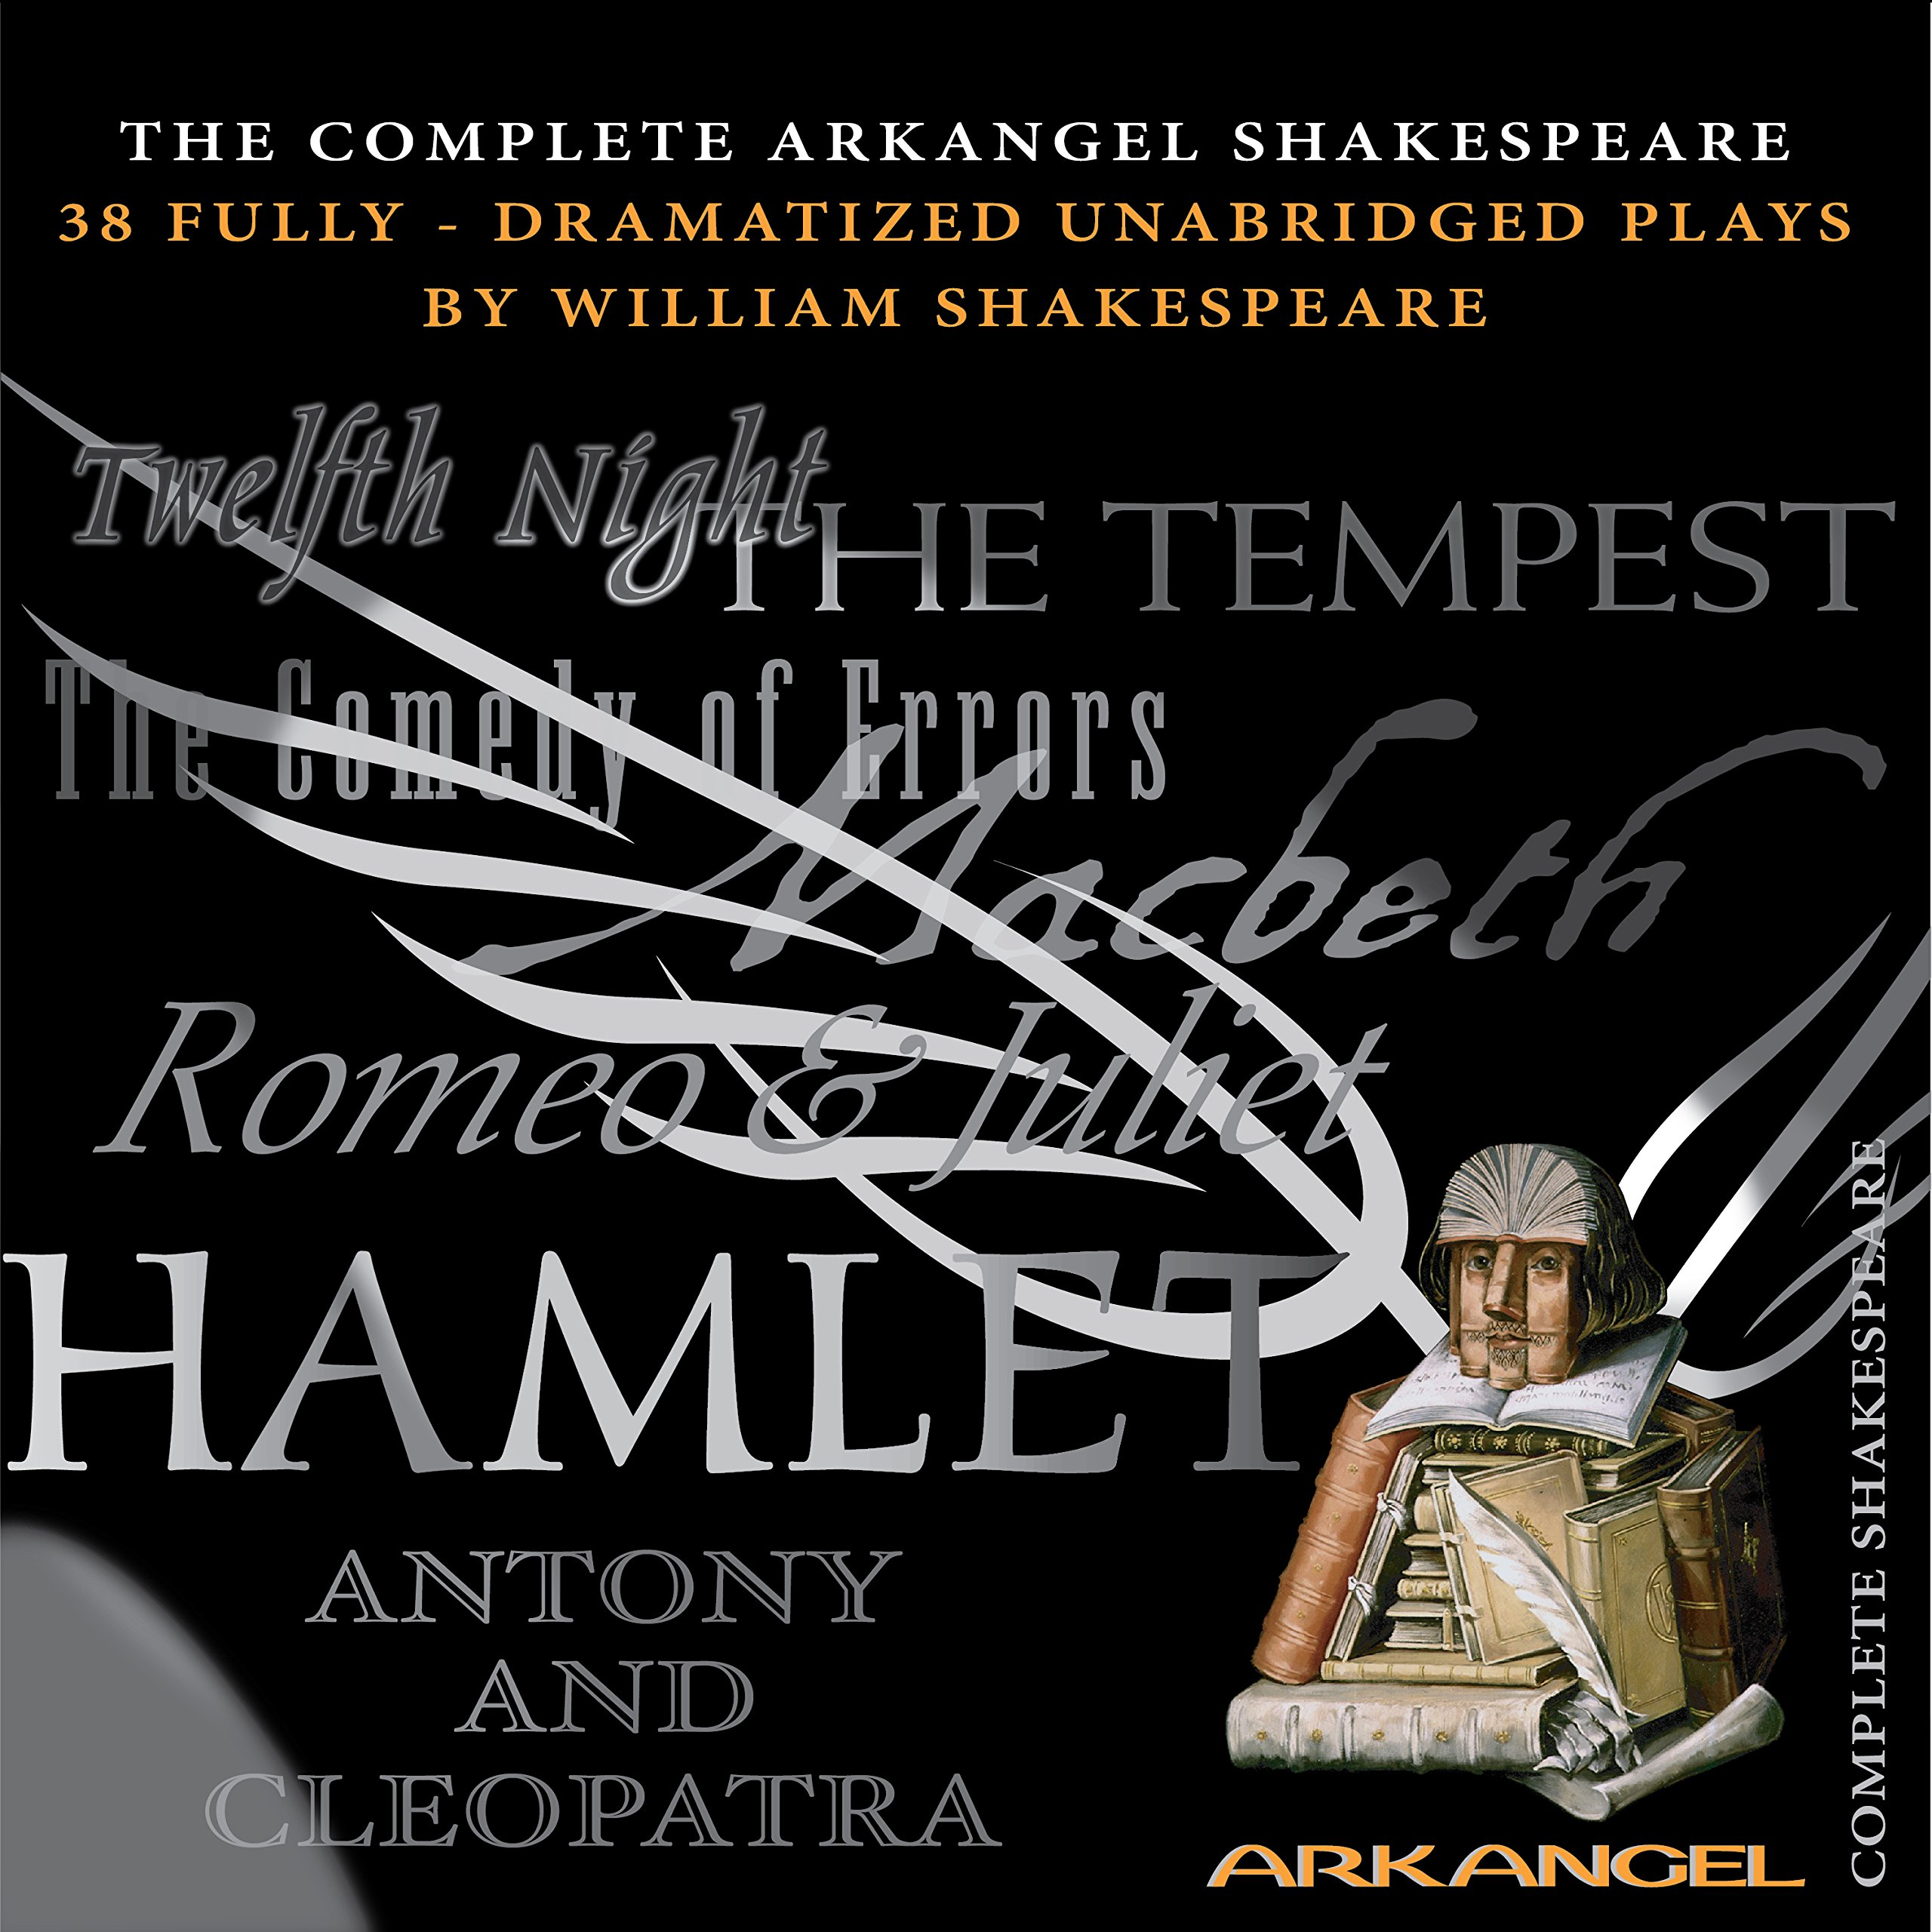 The Complete Arkangel Shakespeare: 38 Fully-Dramatized Plays: William  Shakespeare, Eileen Atkins, Joseph Fiennes, John Gielgud, Imogen Stubbs: ...